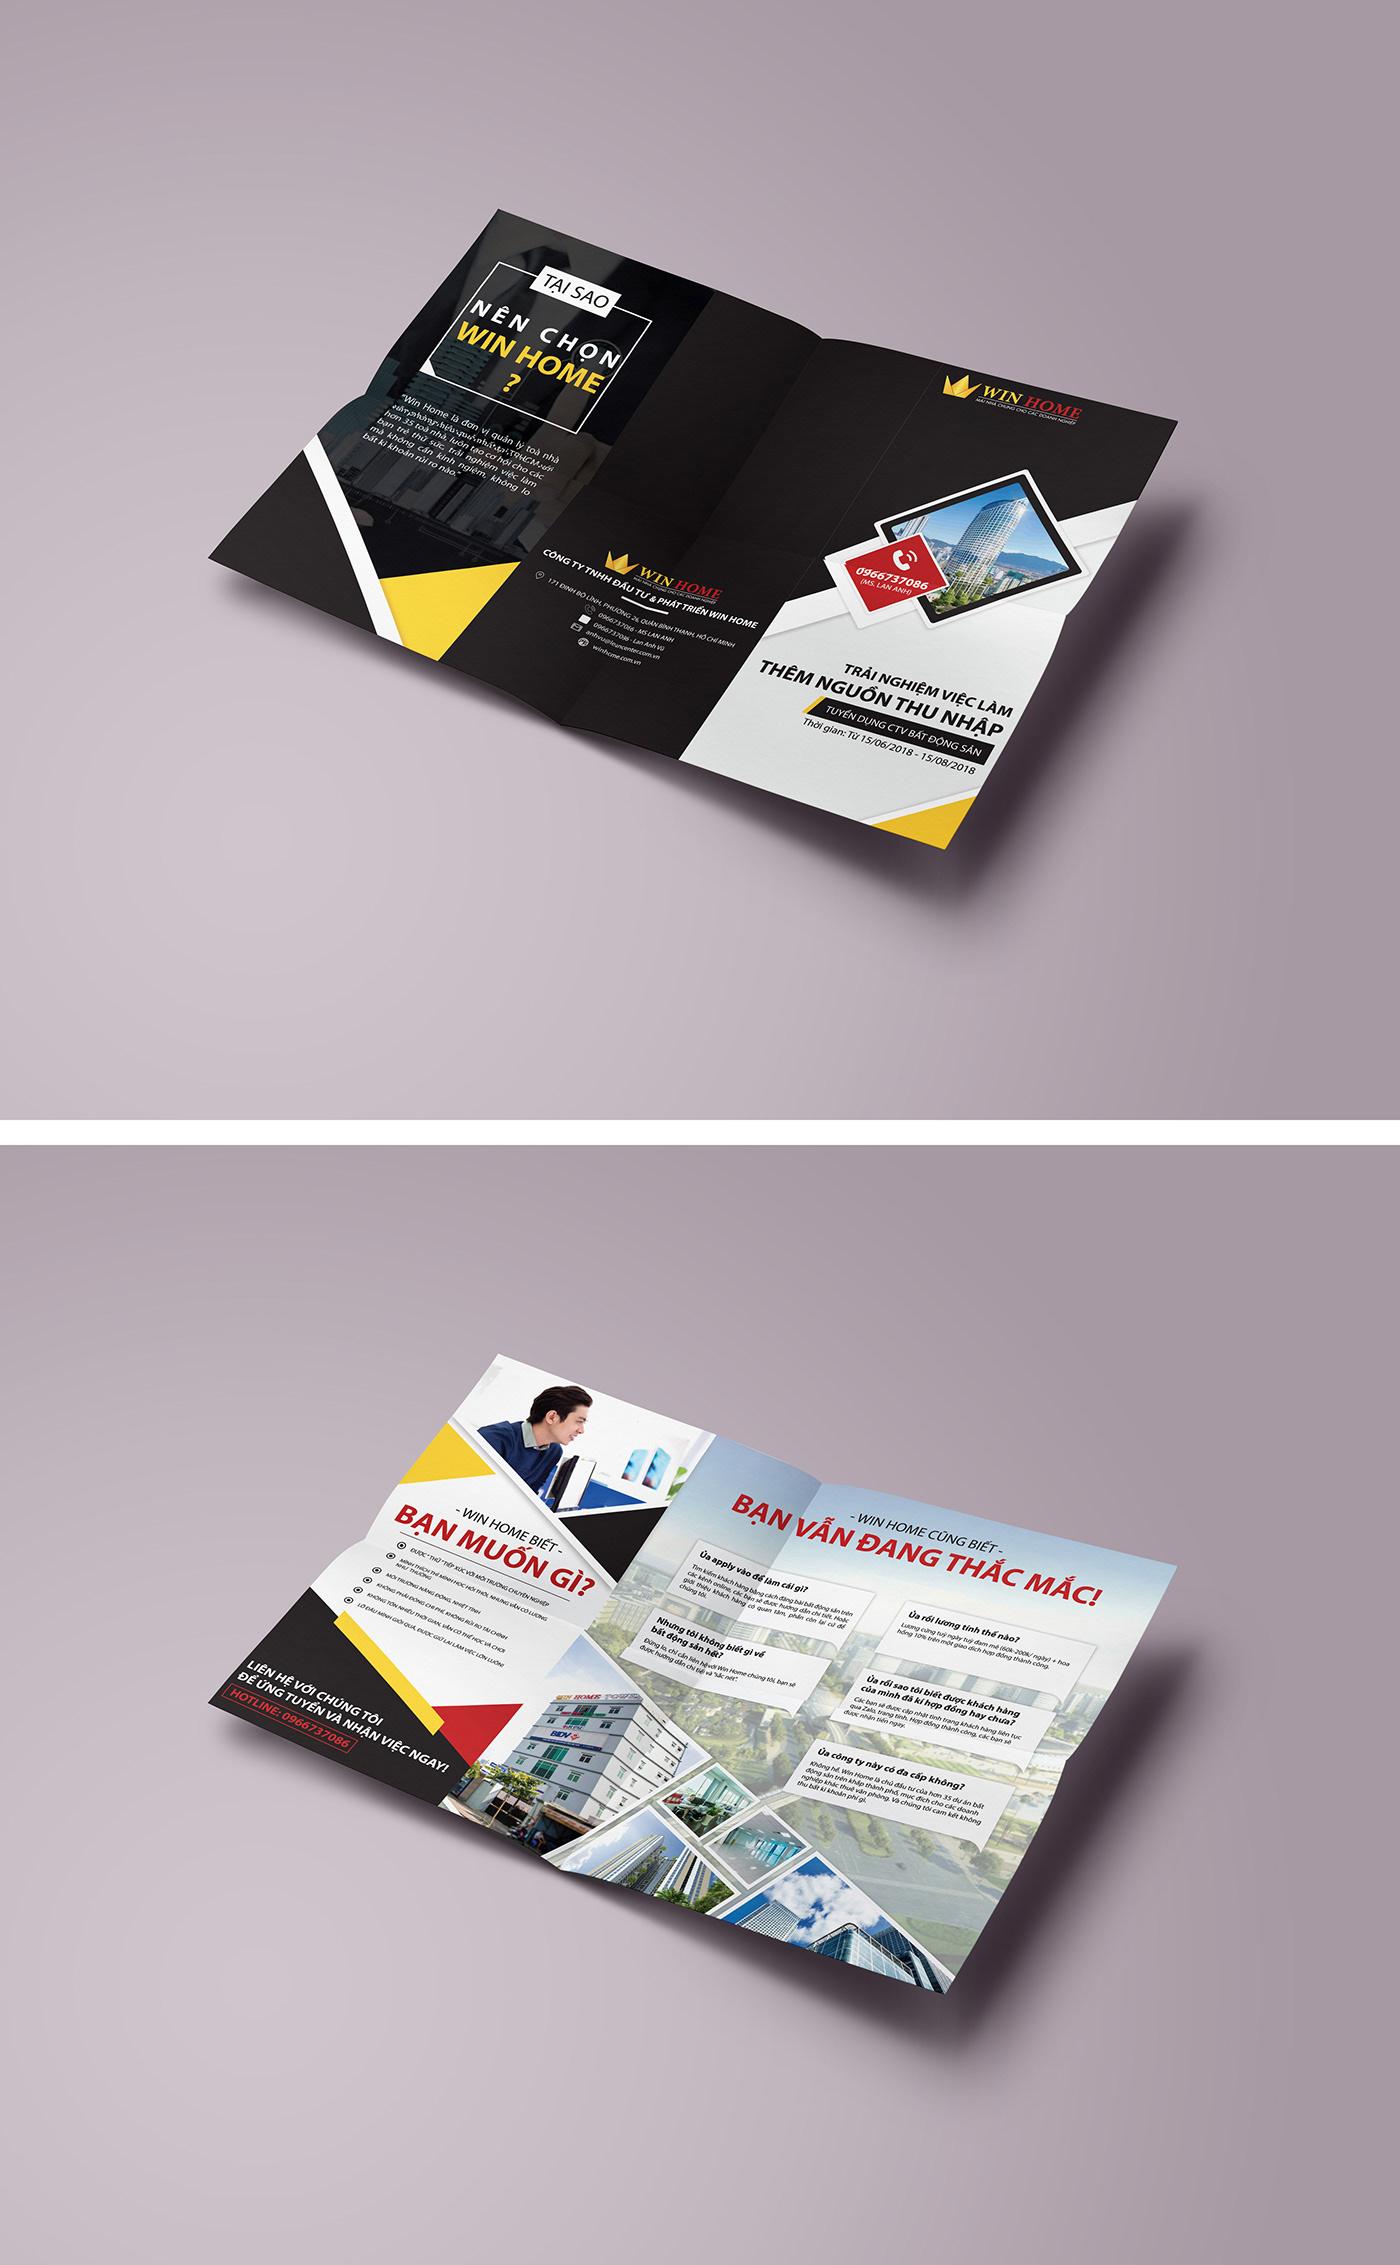 Thiết kế flyer tại thegioidohoa